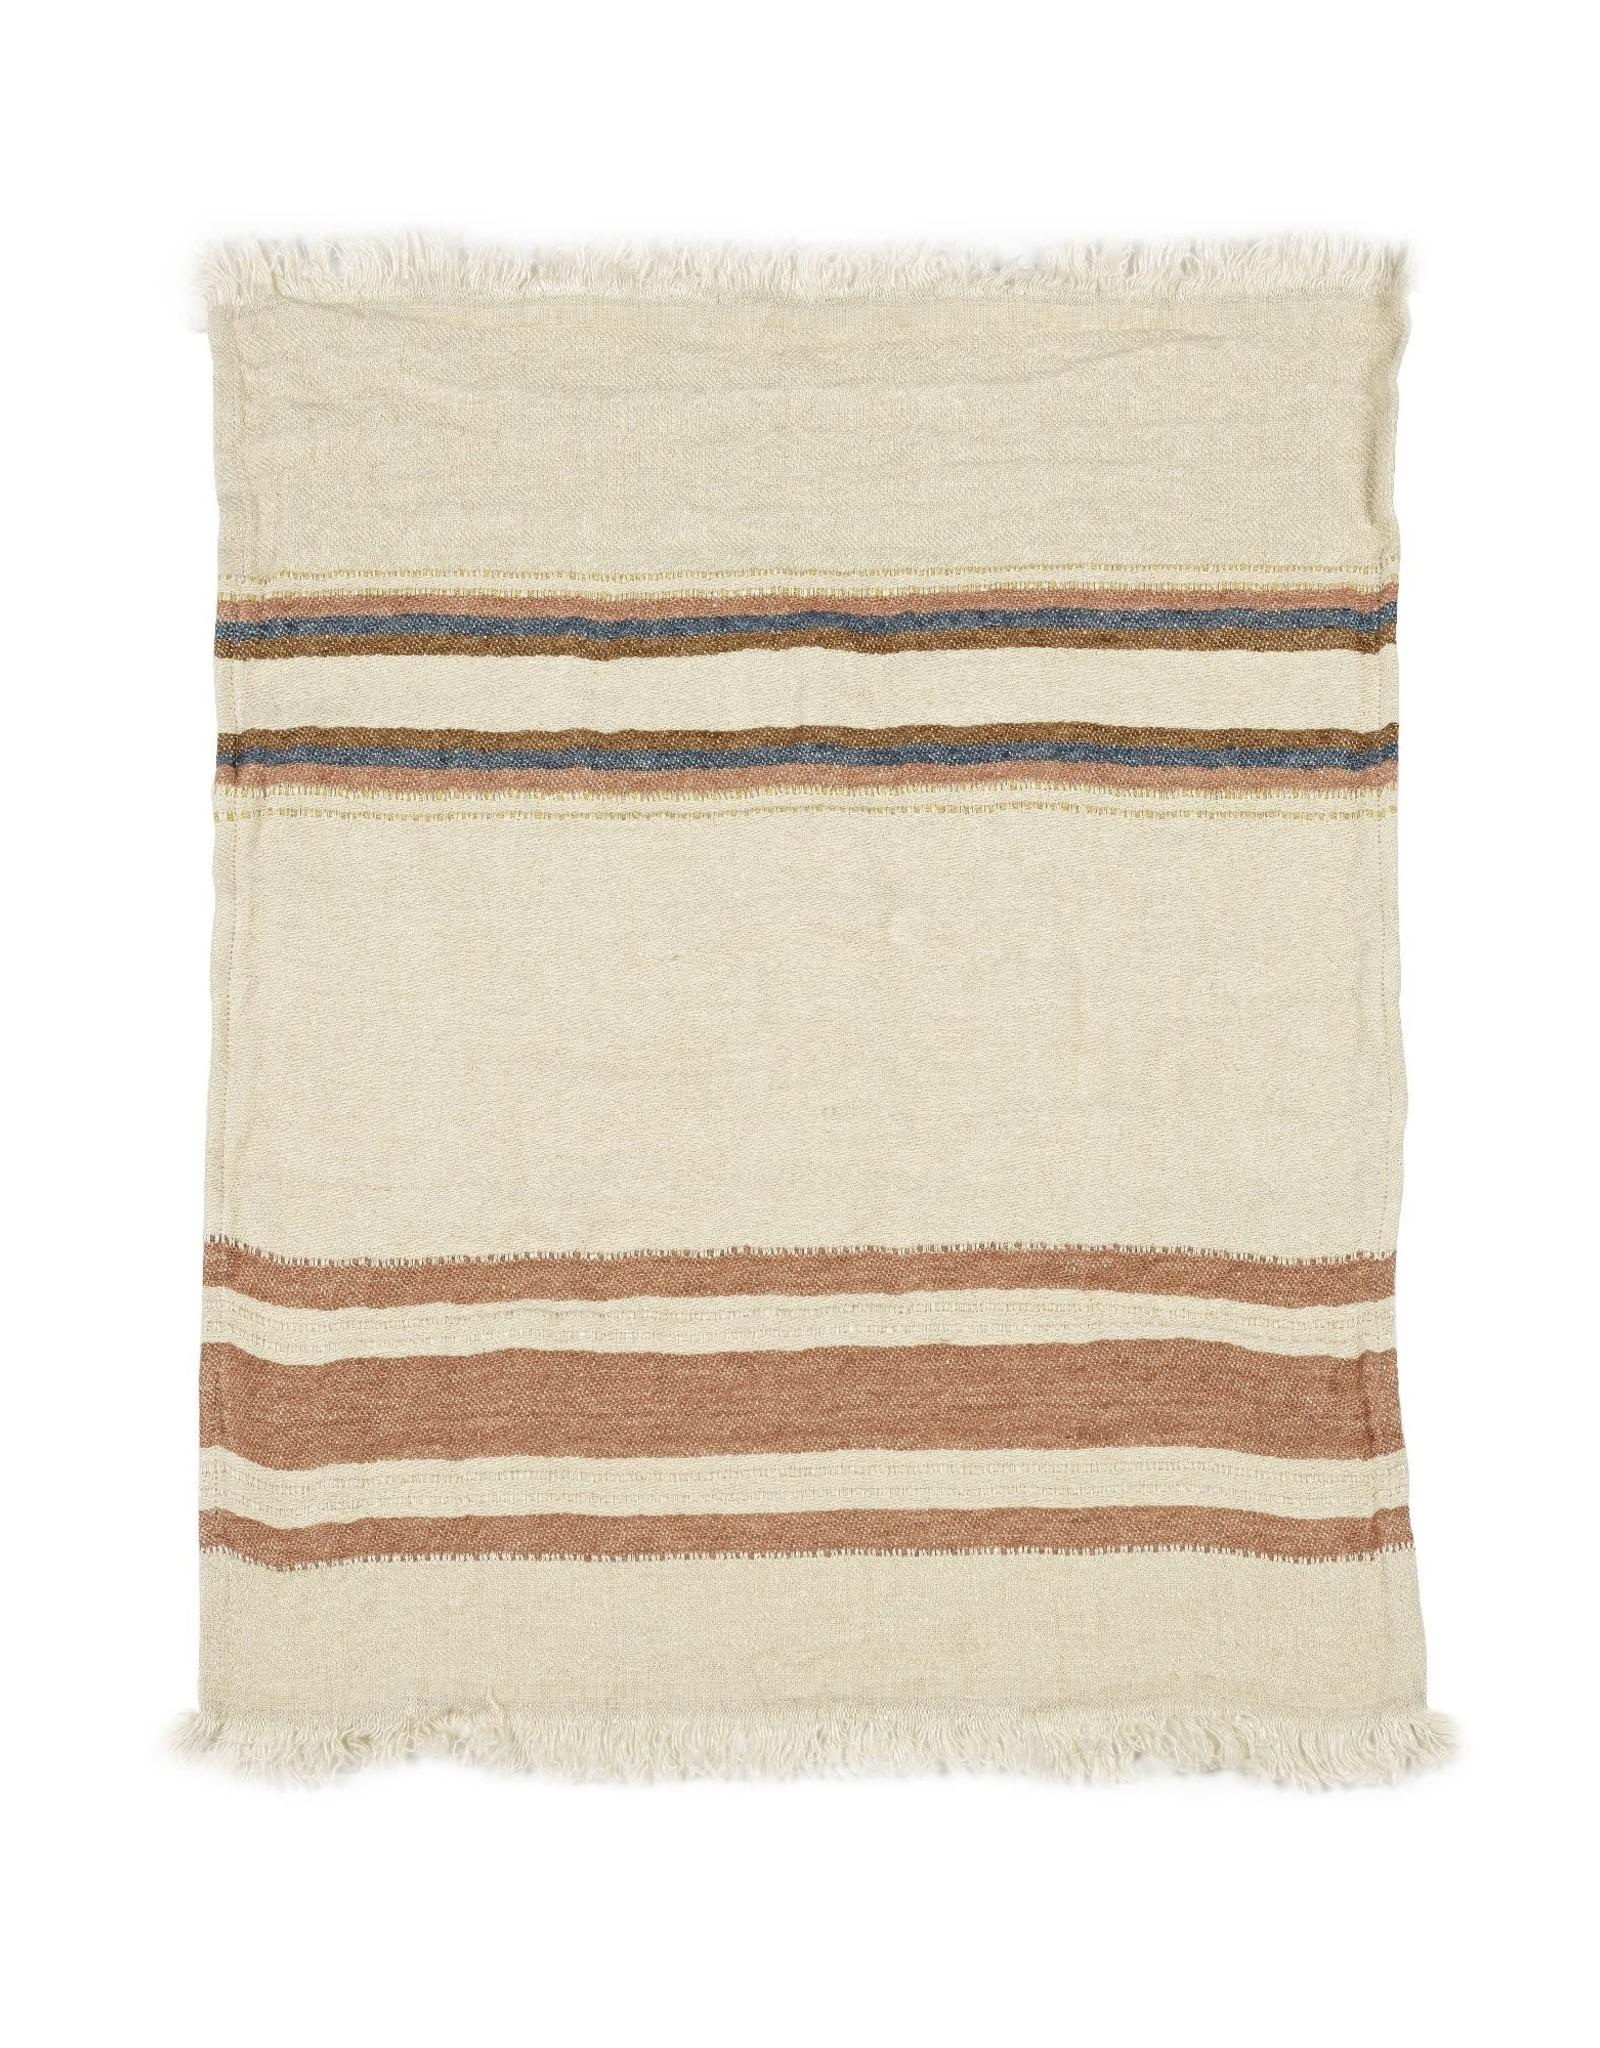 LIBECO LAGAE BLANKET THROW TOWEL FOUTA HARLAN STRIPE 43 X 71